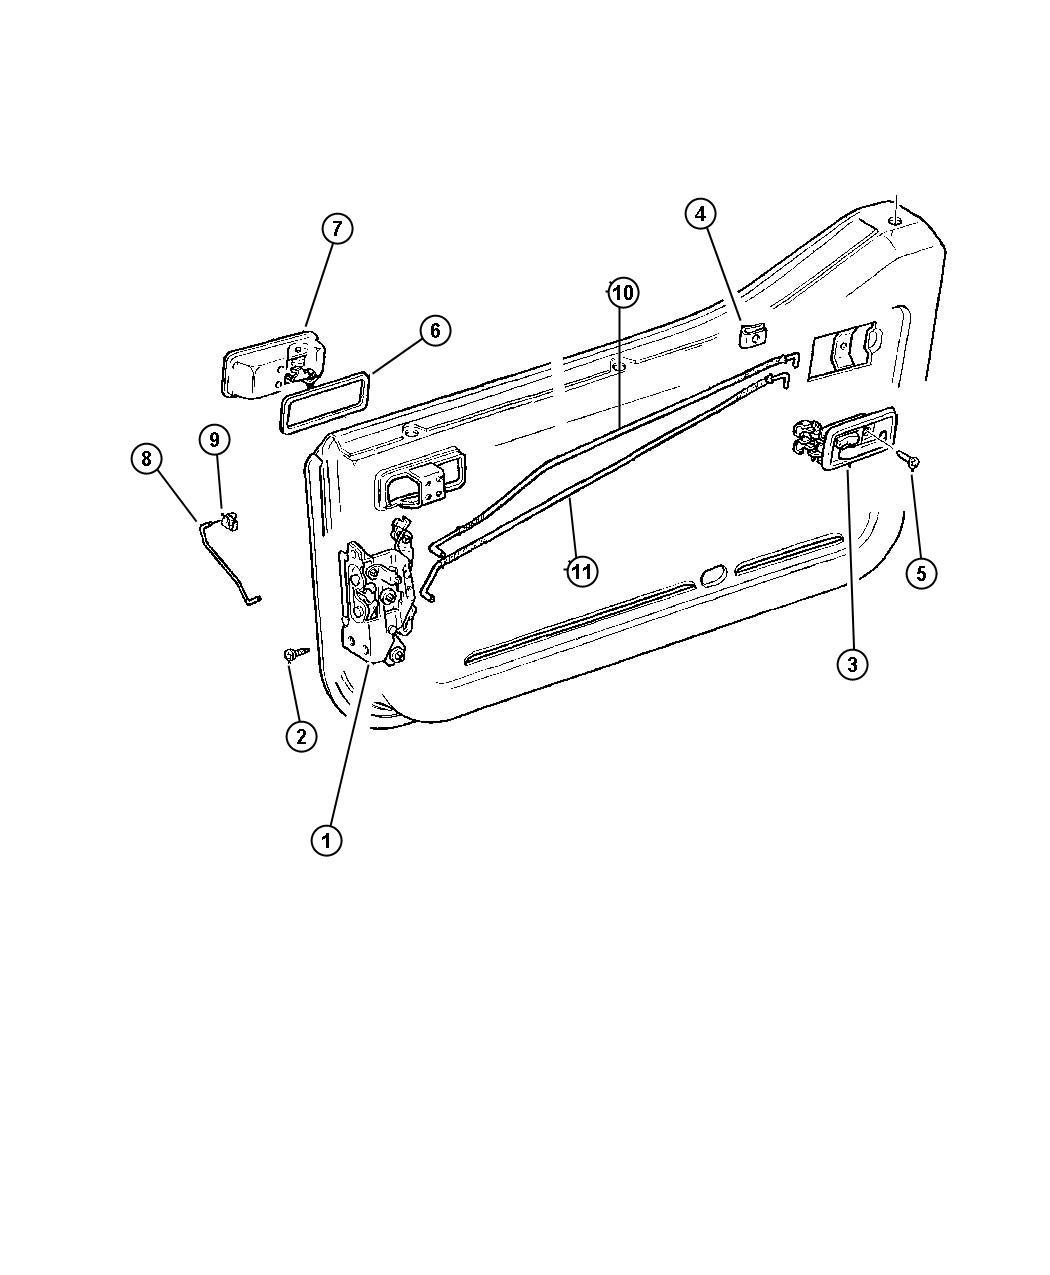 2007 jeep wrangler parts diagram 5 lead placement yj exterior imageresizertool com